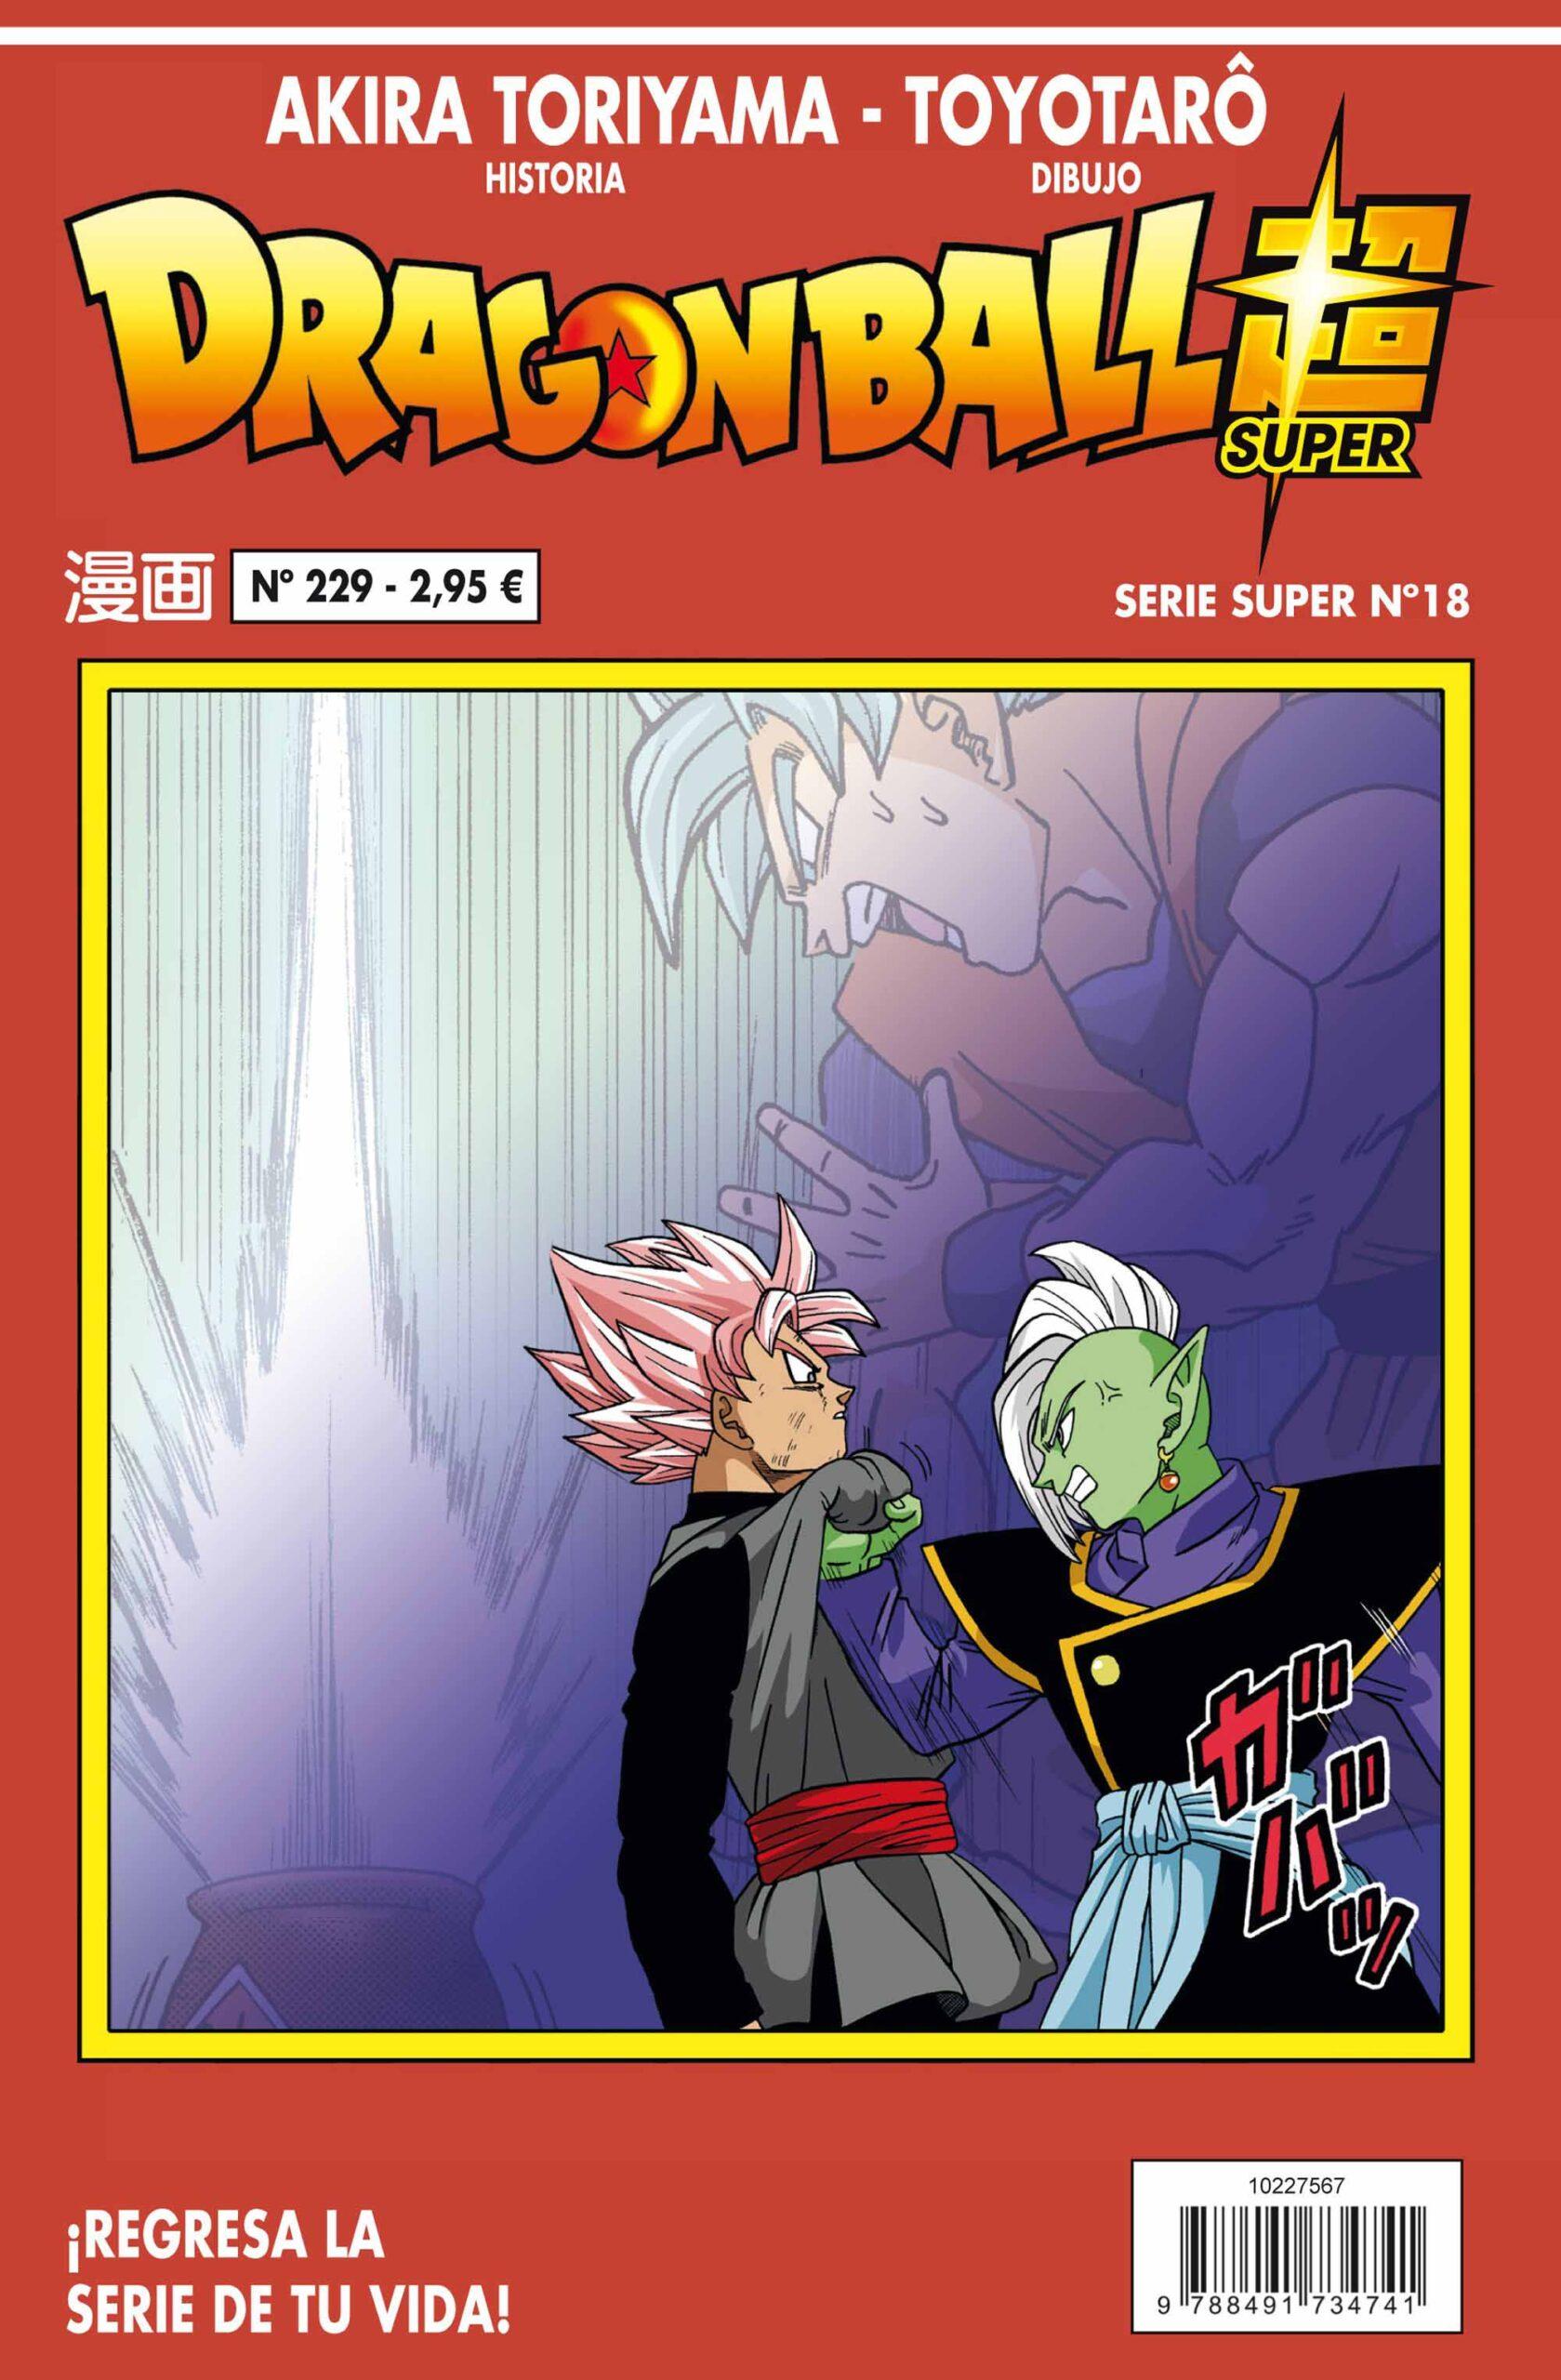 'Dragon Ball Super' 18 / 229 serie roja, reseña del manga